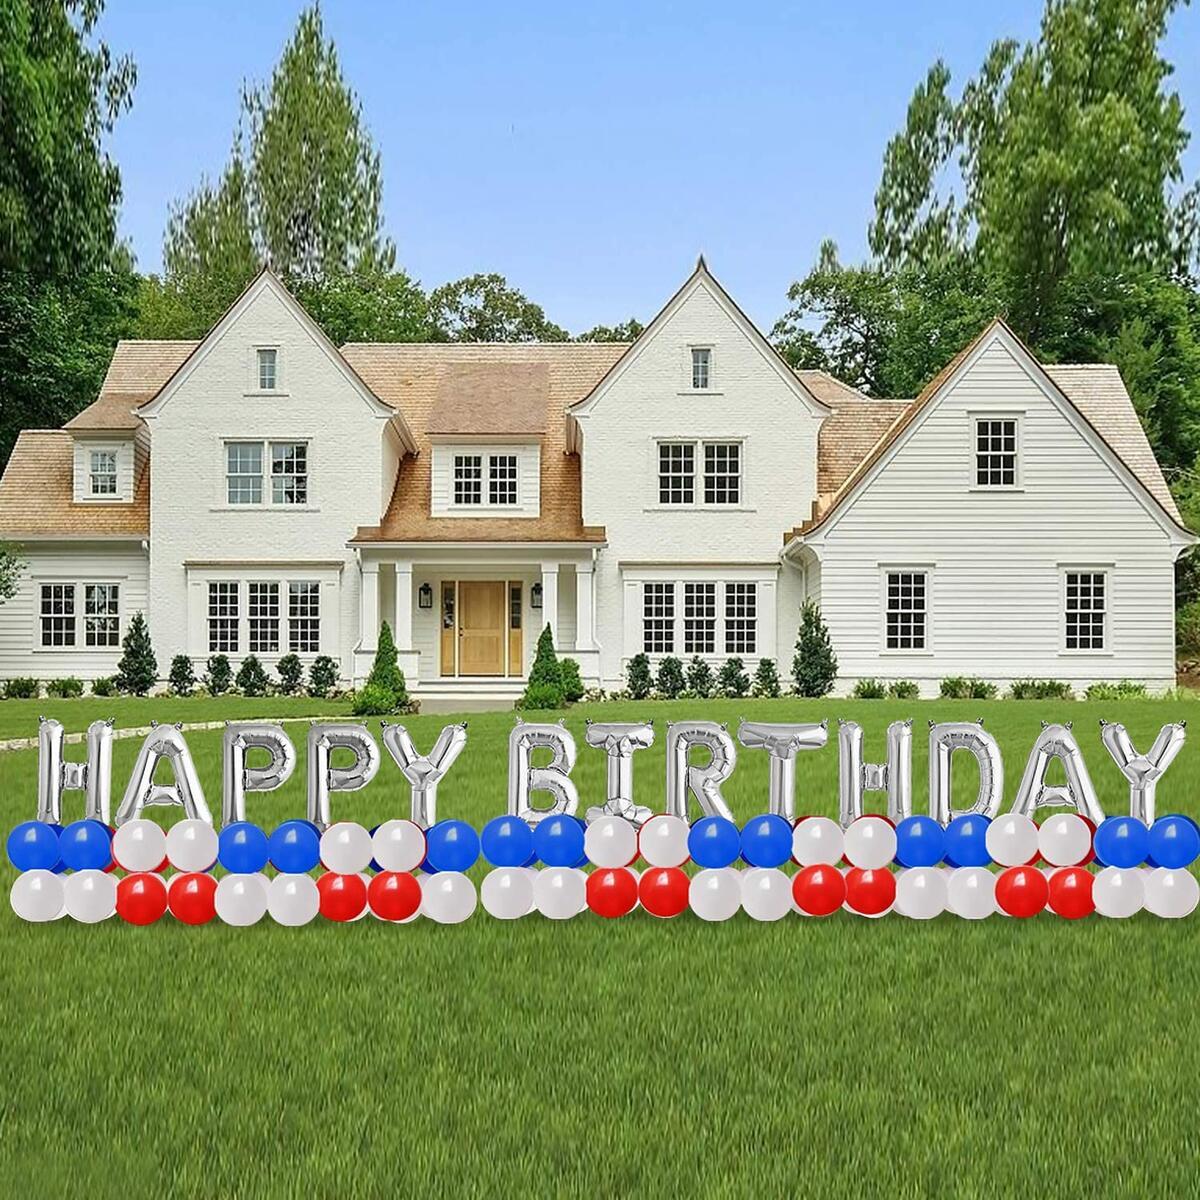 LiliviLLe happy birthday banner-224PCS Happy Birthday Balloon/Happy Birthday Yard Sign with 32inch HAPPY BIRTHDAY foil balloons for Birthday Decoration/Huge Birthday Outdoor Decoration